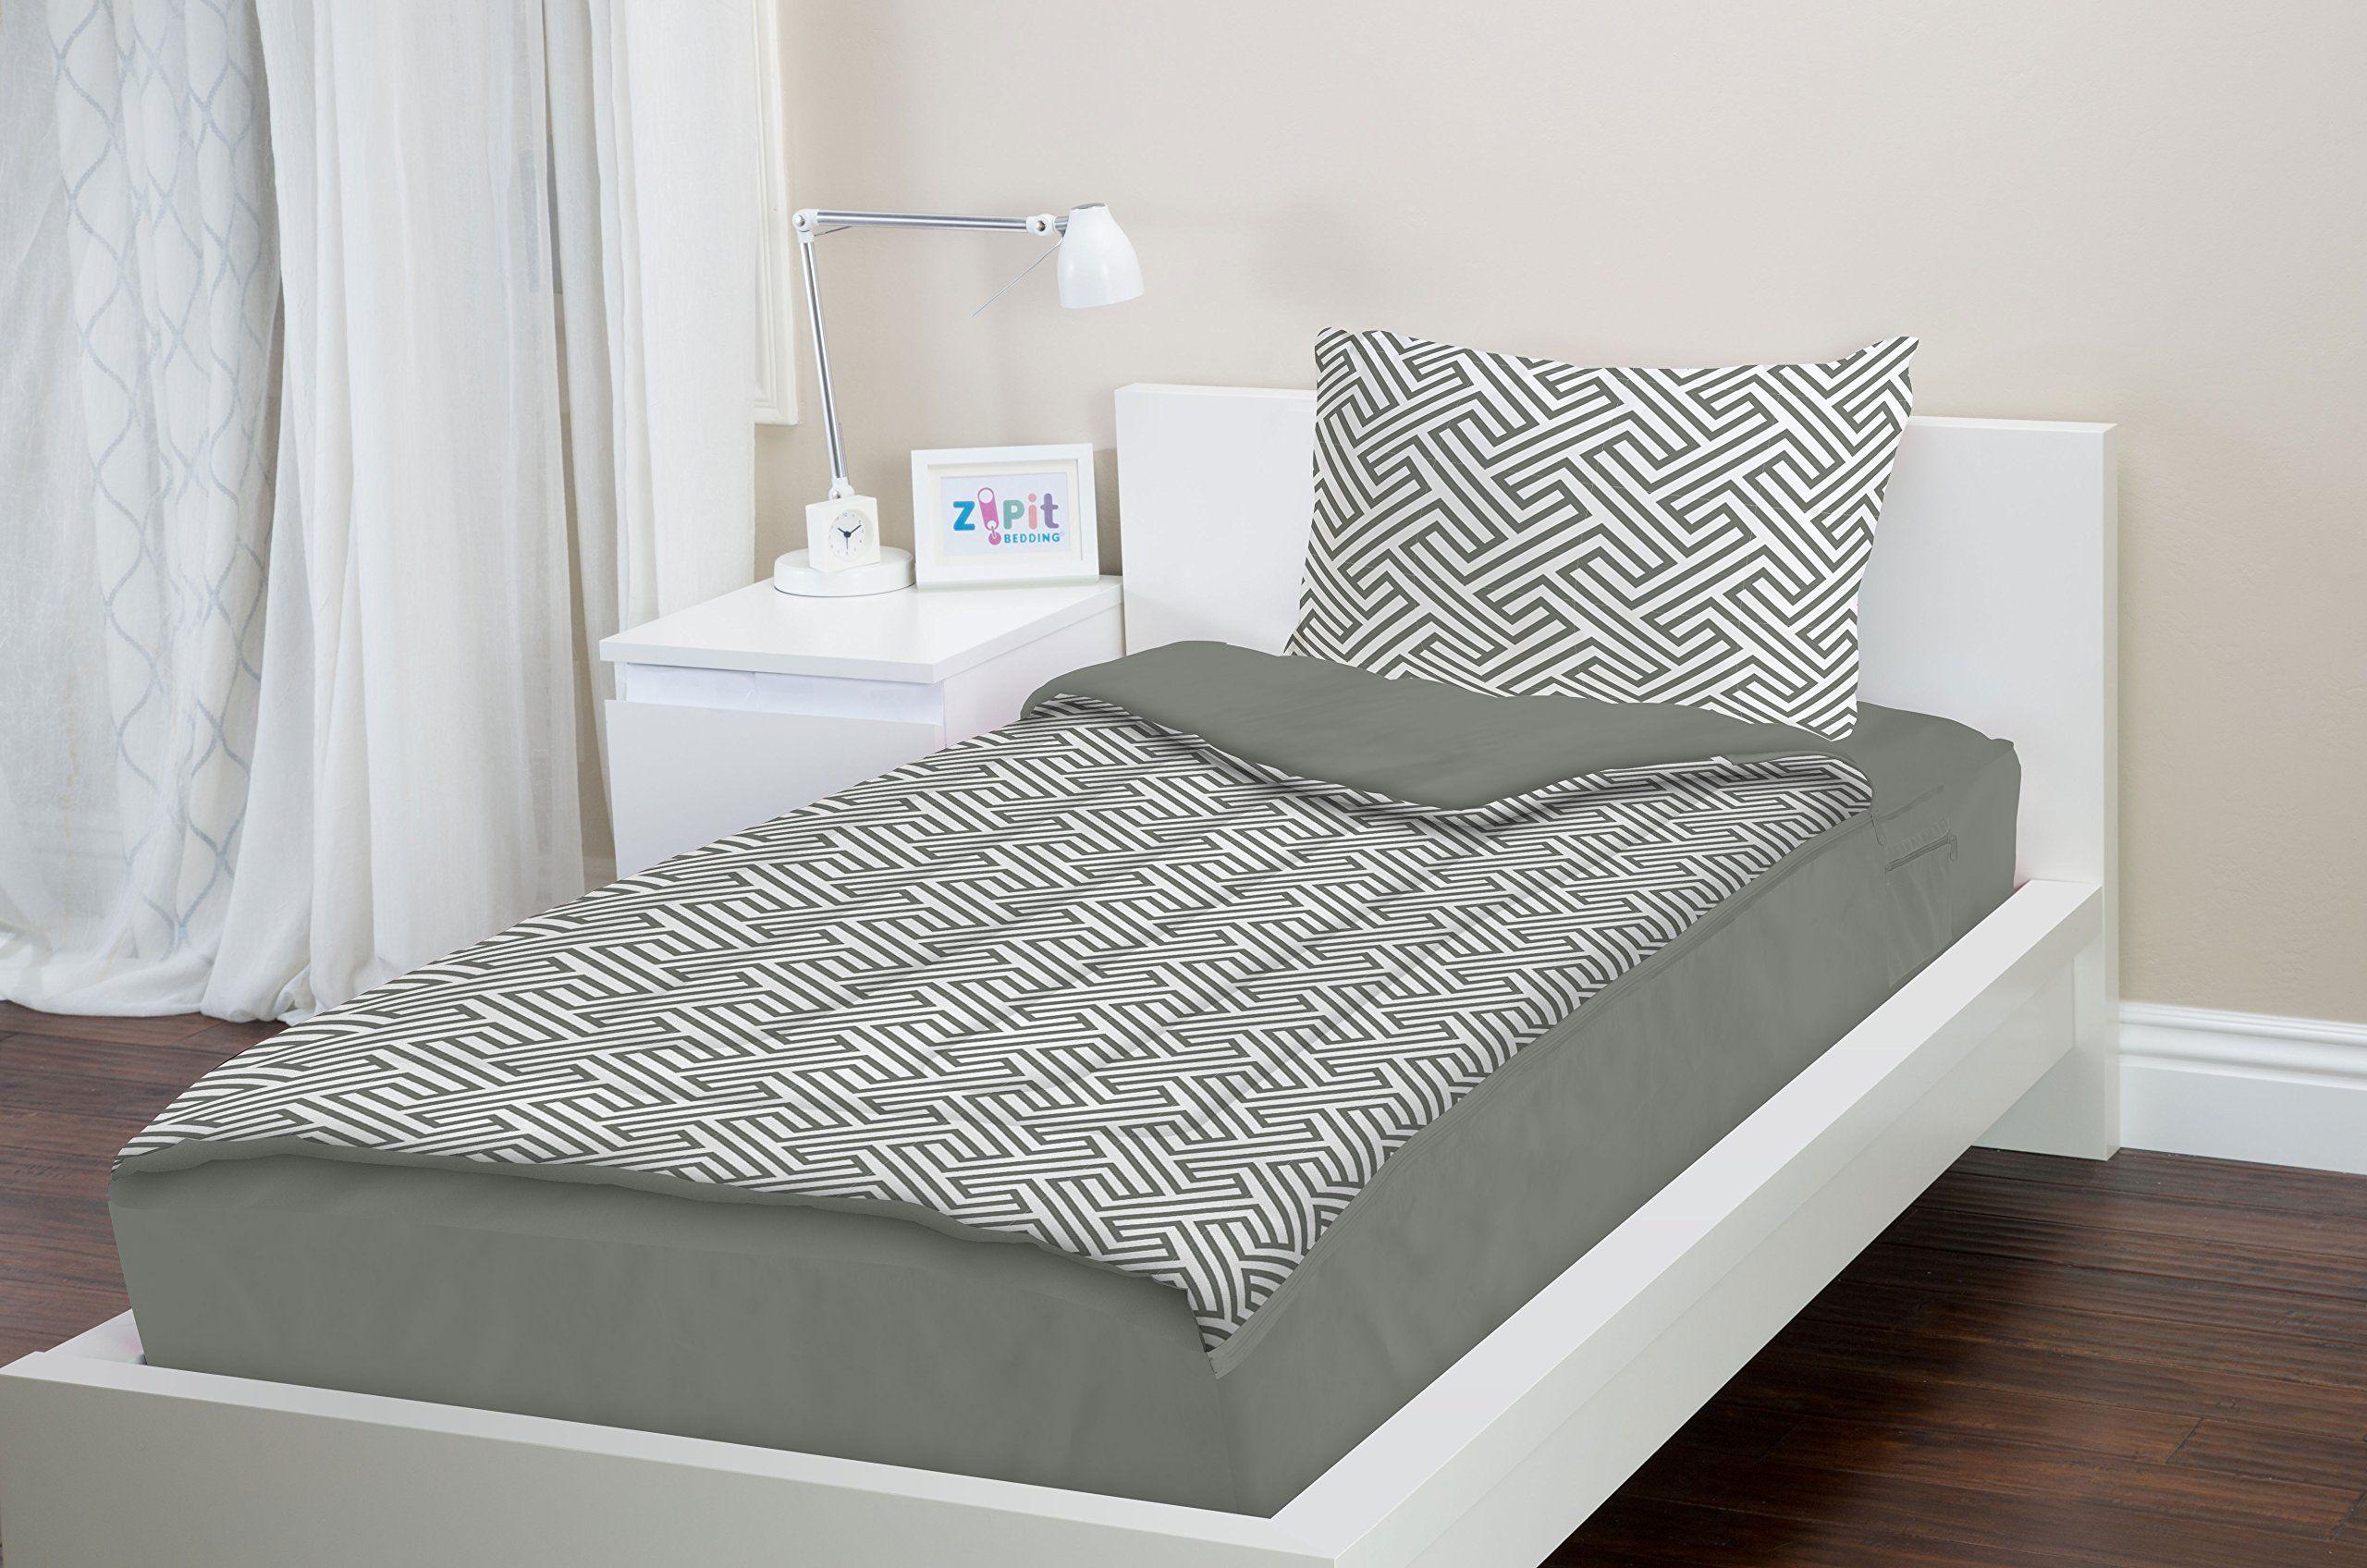 Zipit Bedding Set, Full, Gray Geometric Zip